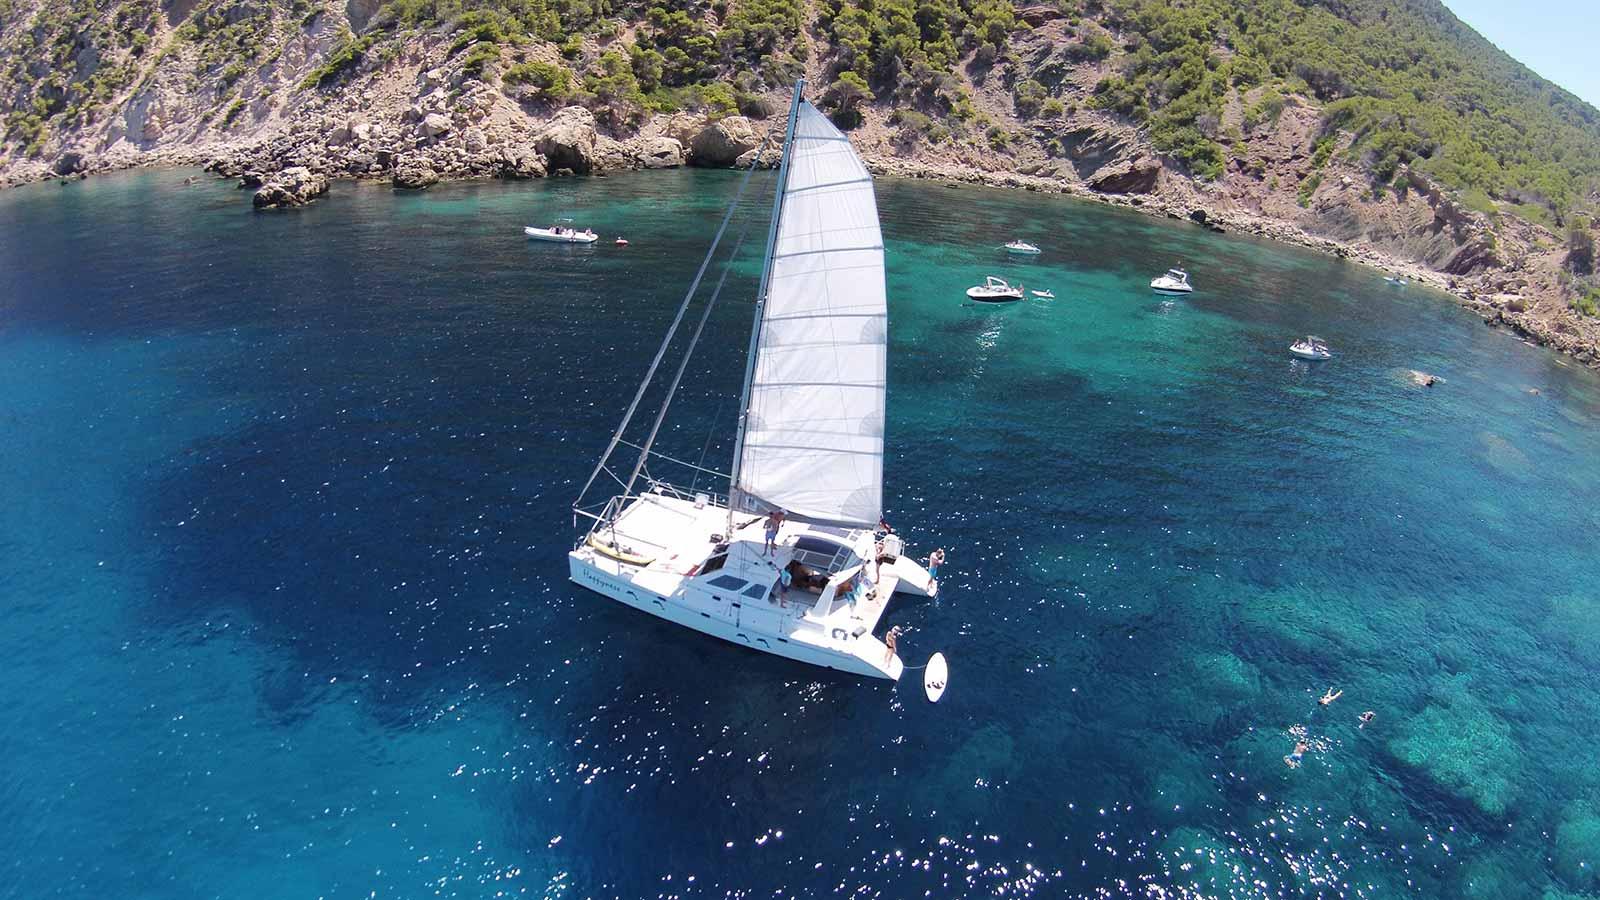 Kleiner-Katamaran-Bootcharter-Mallorca-Katamaran-Mallorca-5